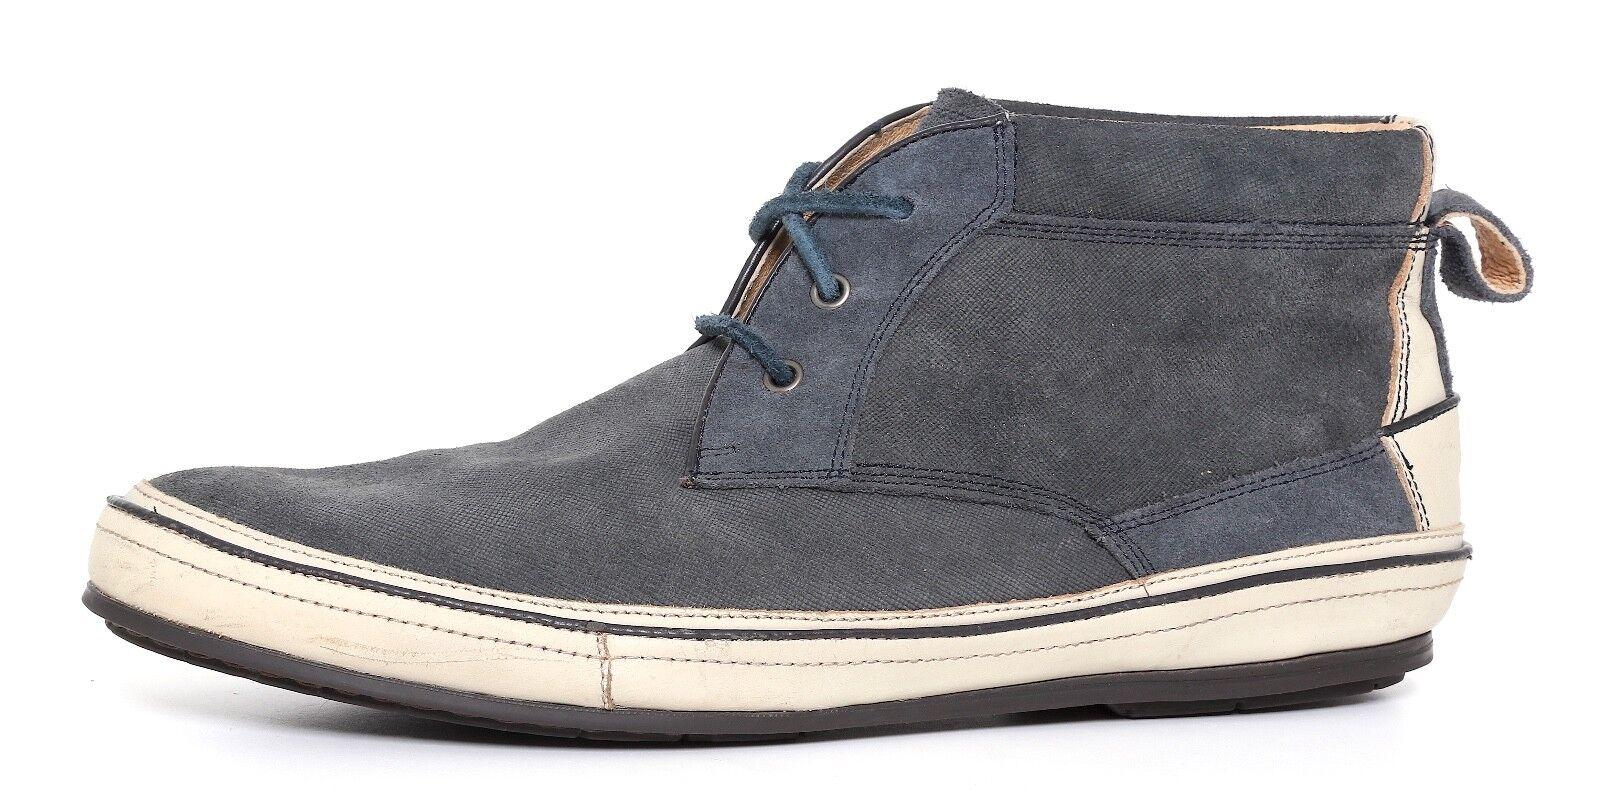 John Varvatos Ankle Stivali Suede Navy Blue Uomo Sz 9.5 M 1137